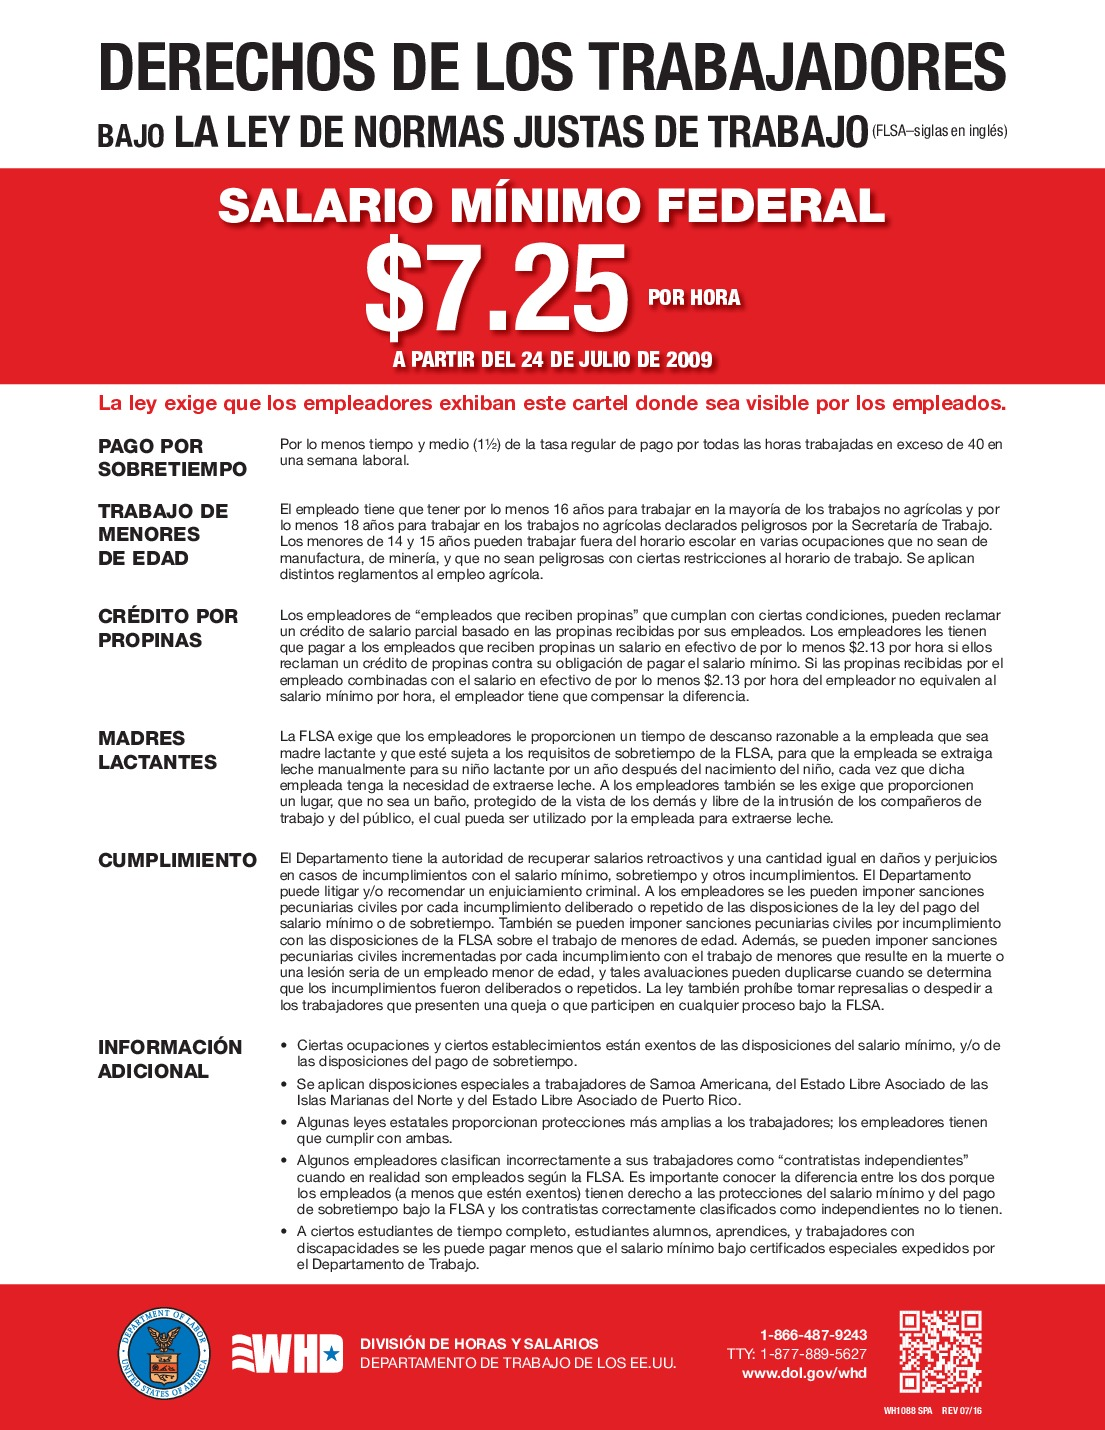 free federal minimum wage spanish 2021